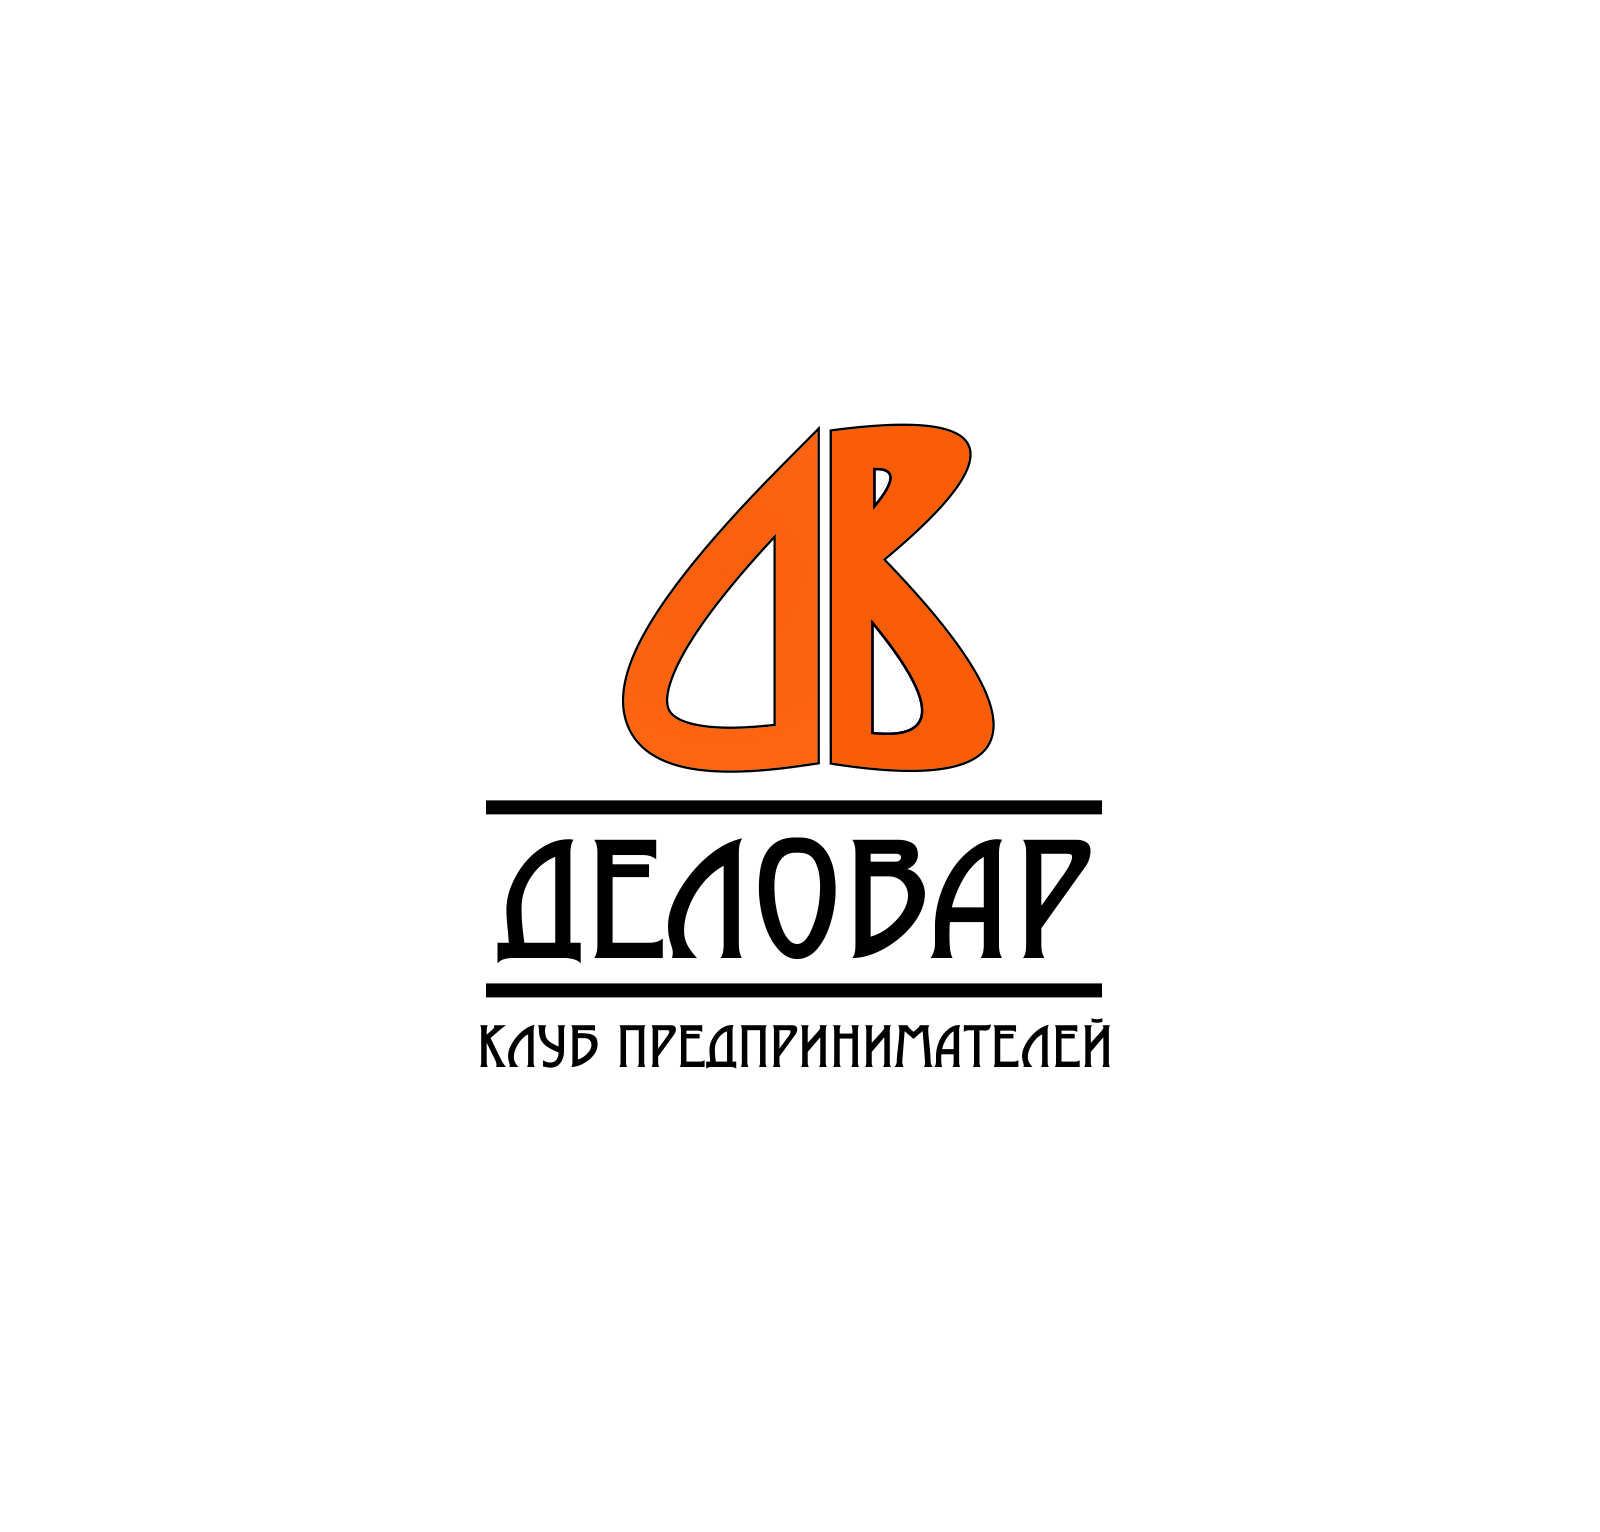 "Логотип и фирм. стиль для Клуба предпринимателей ""Деловар"" фото f_5045dbc0b60d1.jpg"